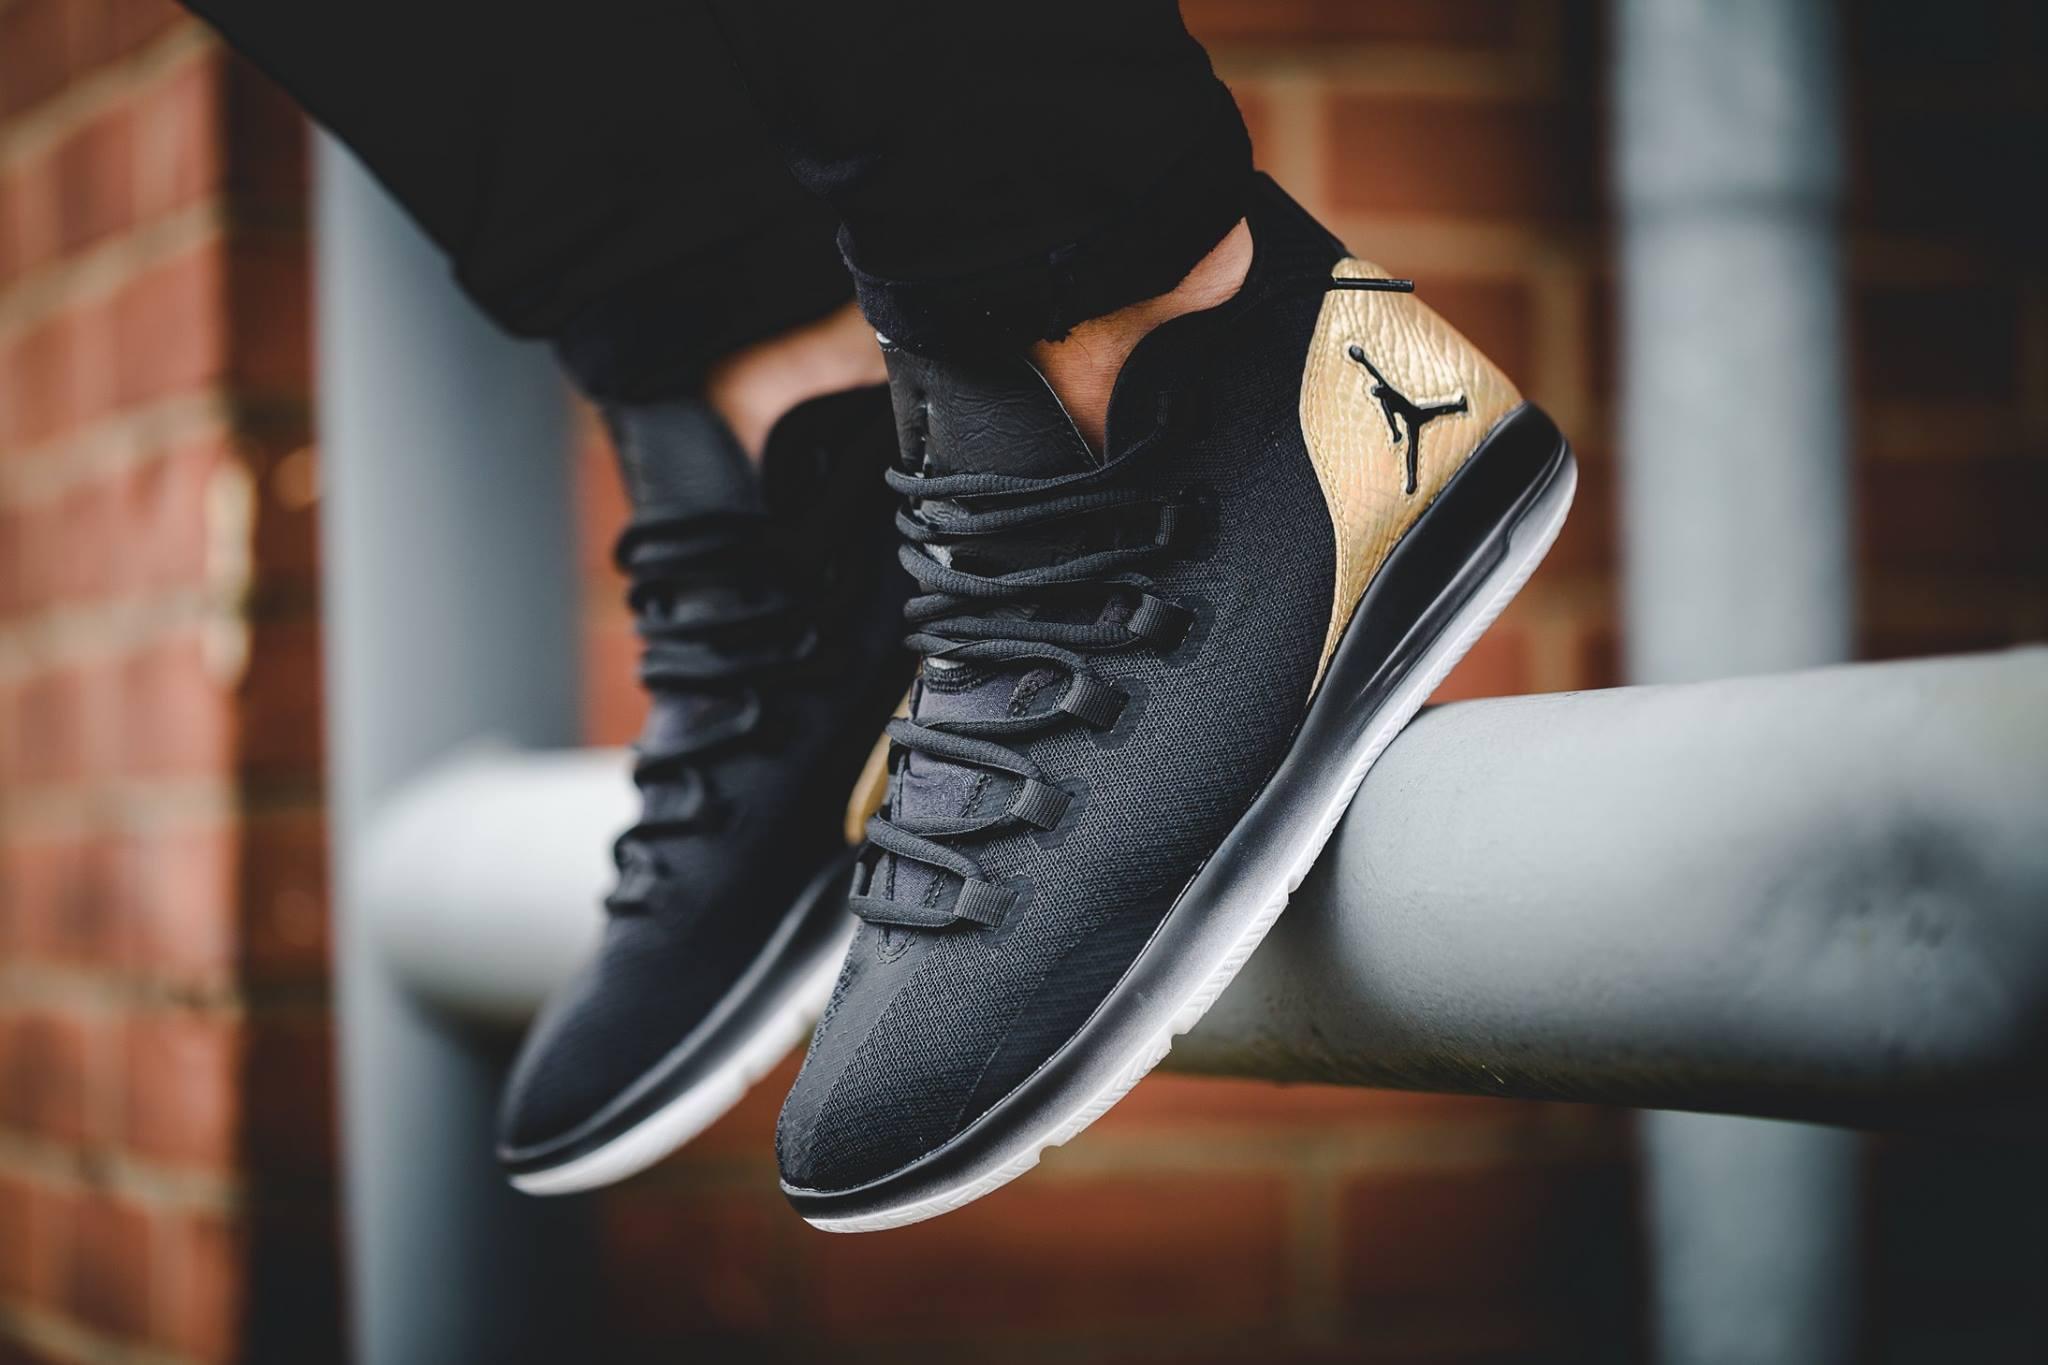 acheter Air Jordan Reveal Black Metallic Gold Quai 54 (1)